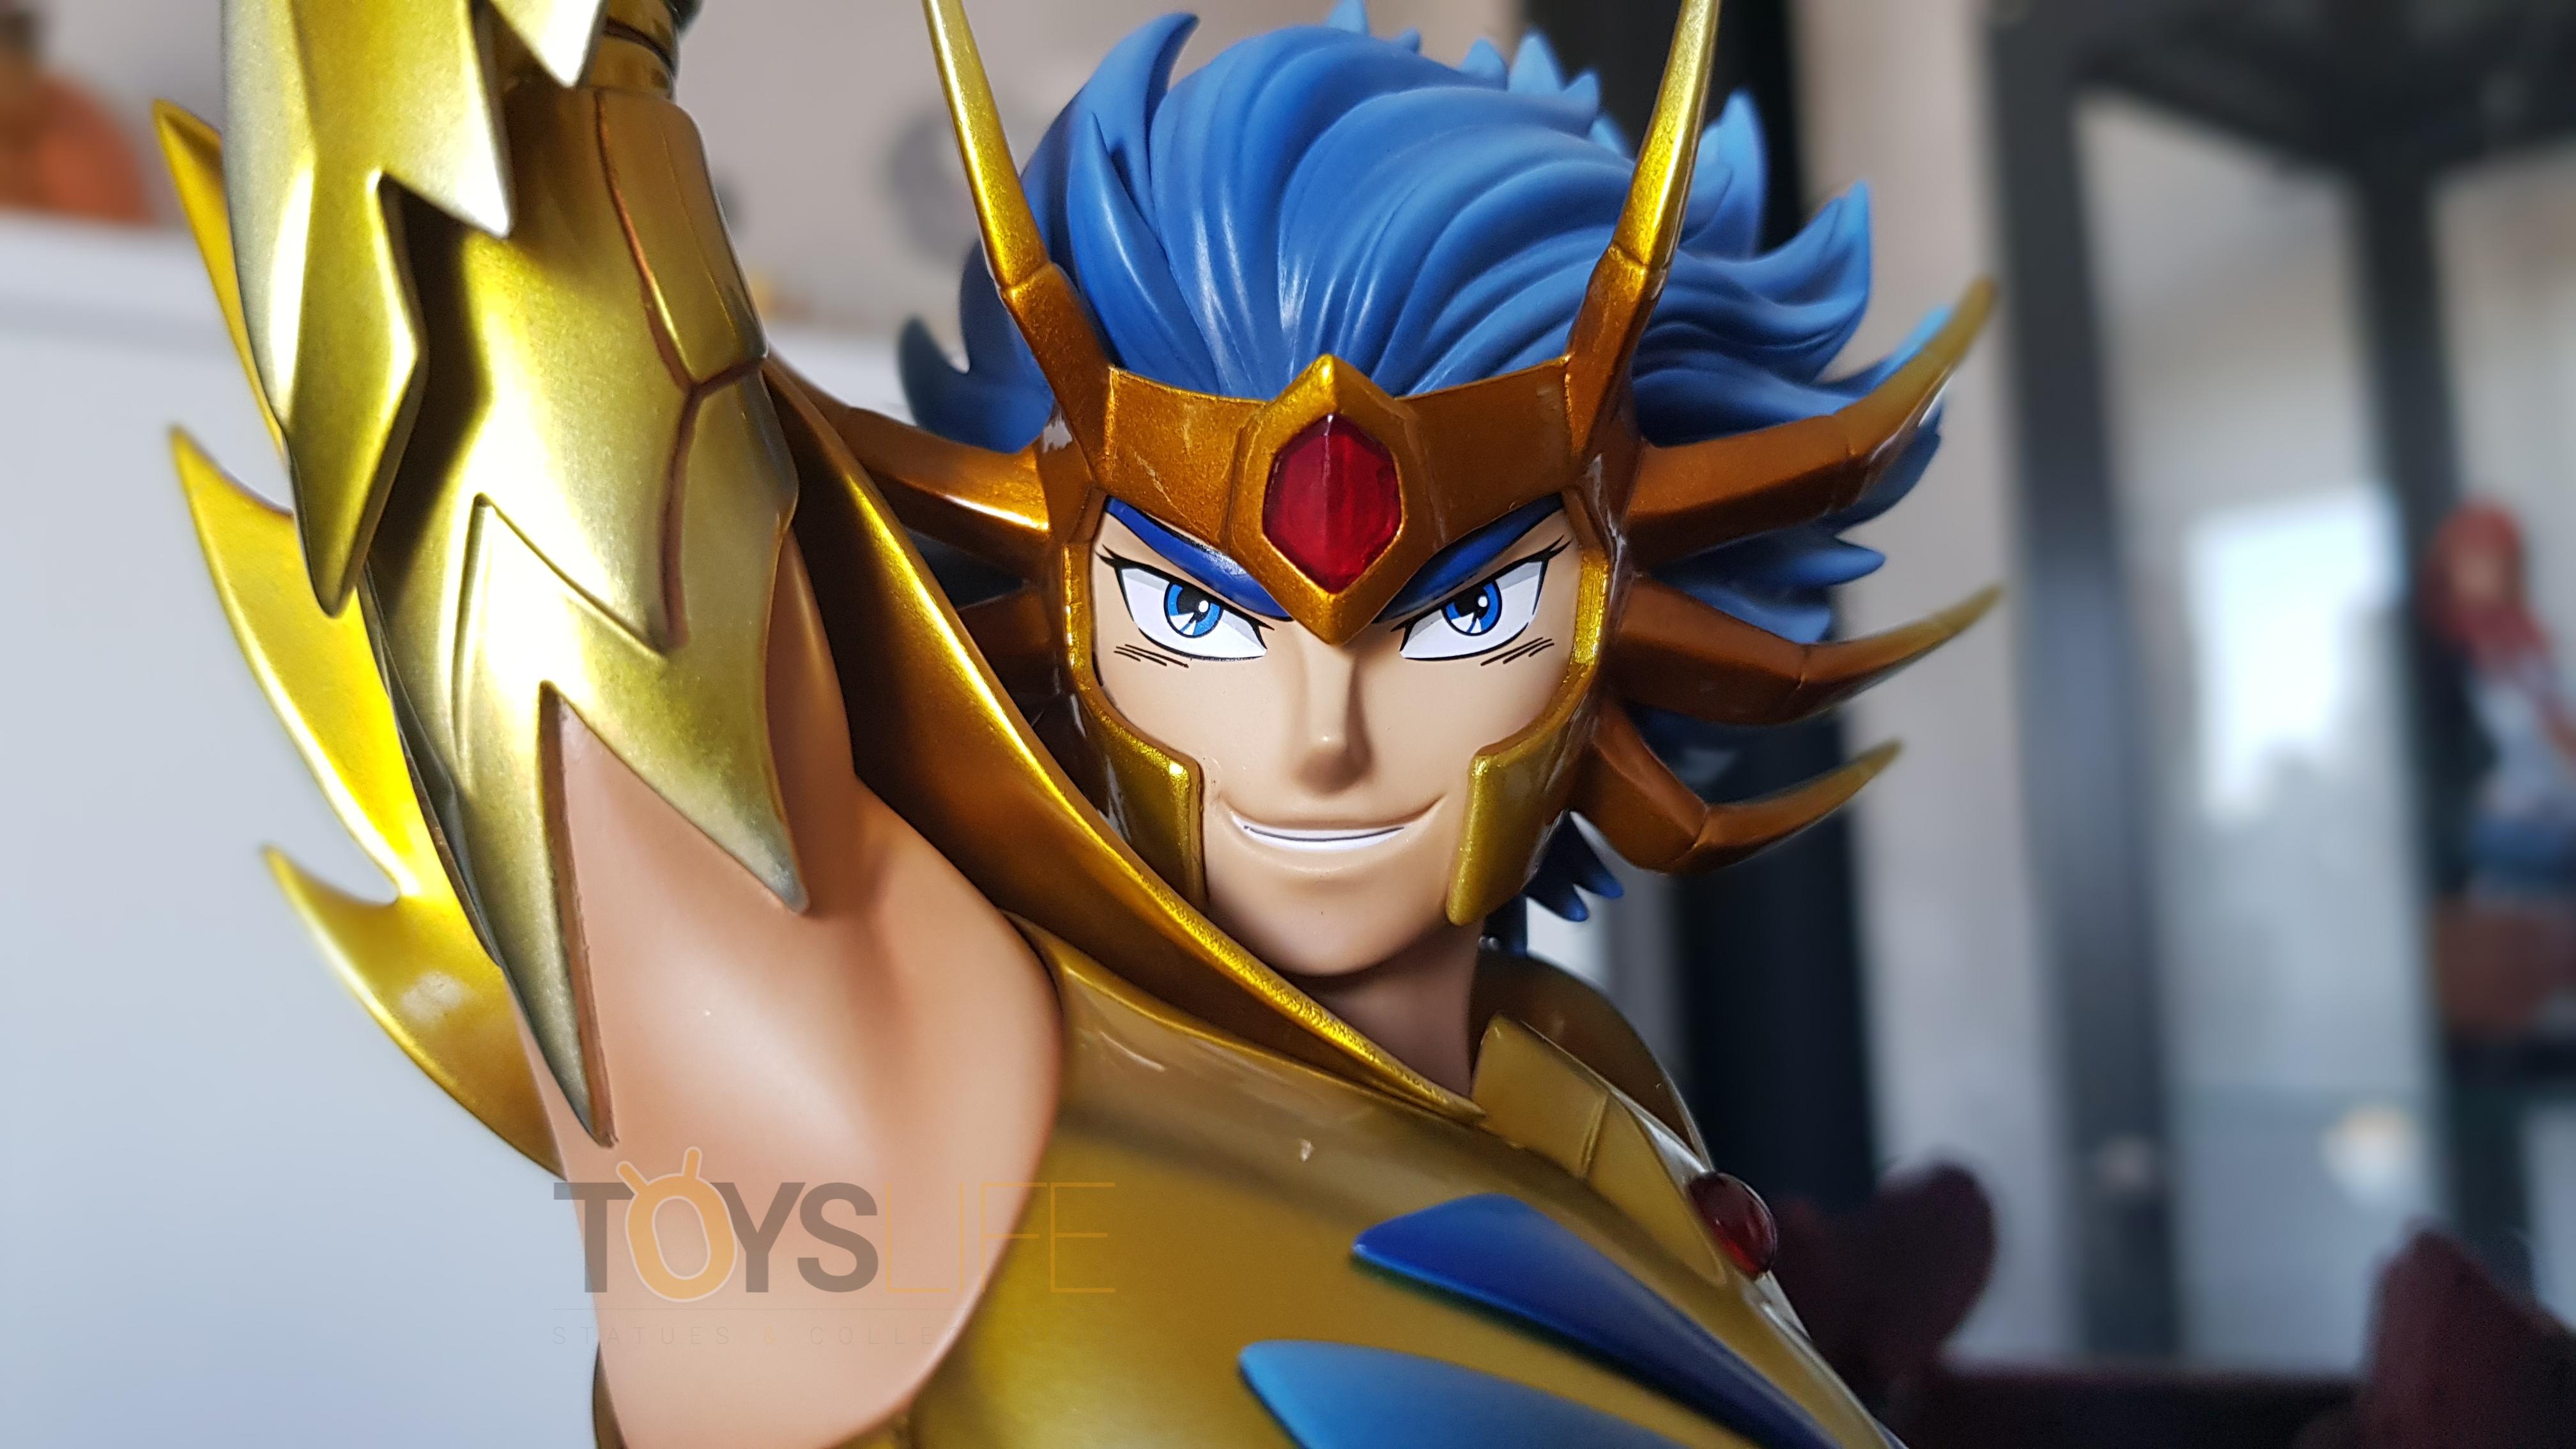 tsume-art-saint-seiya-gold-saint-death-mask-statue-toyslife-review-39